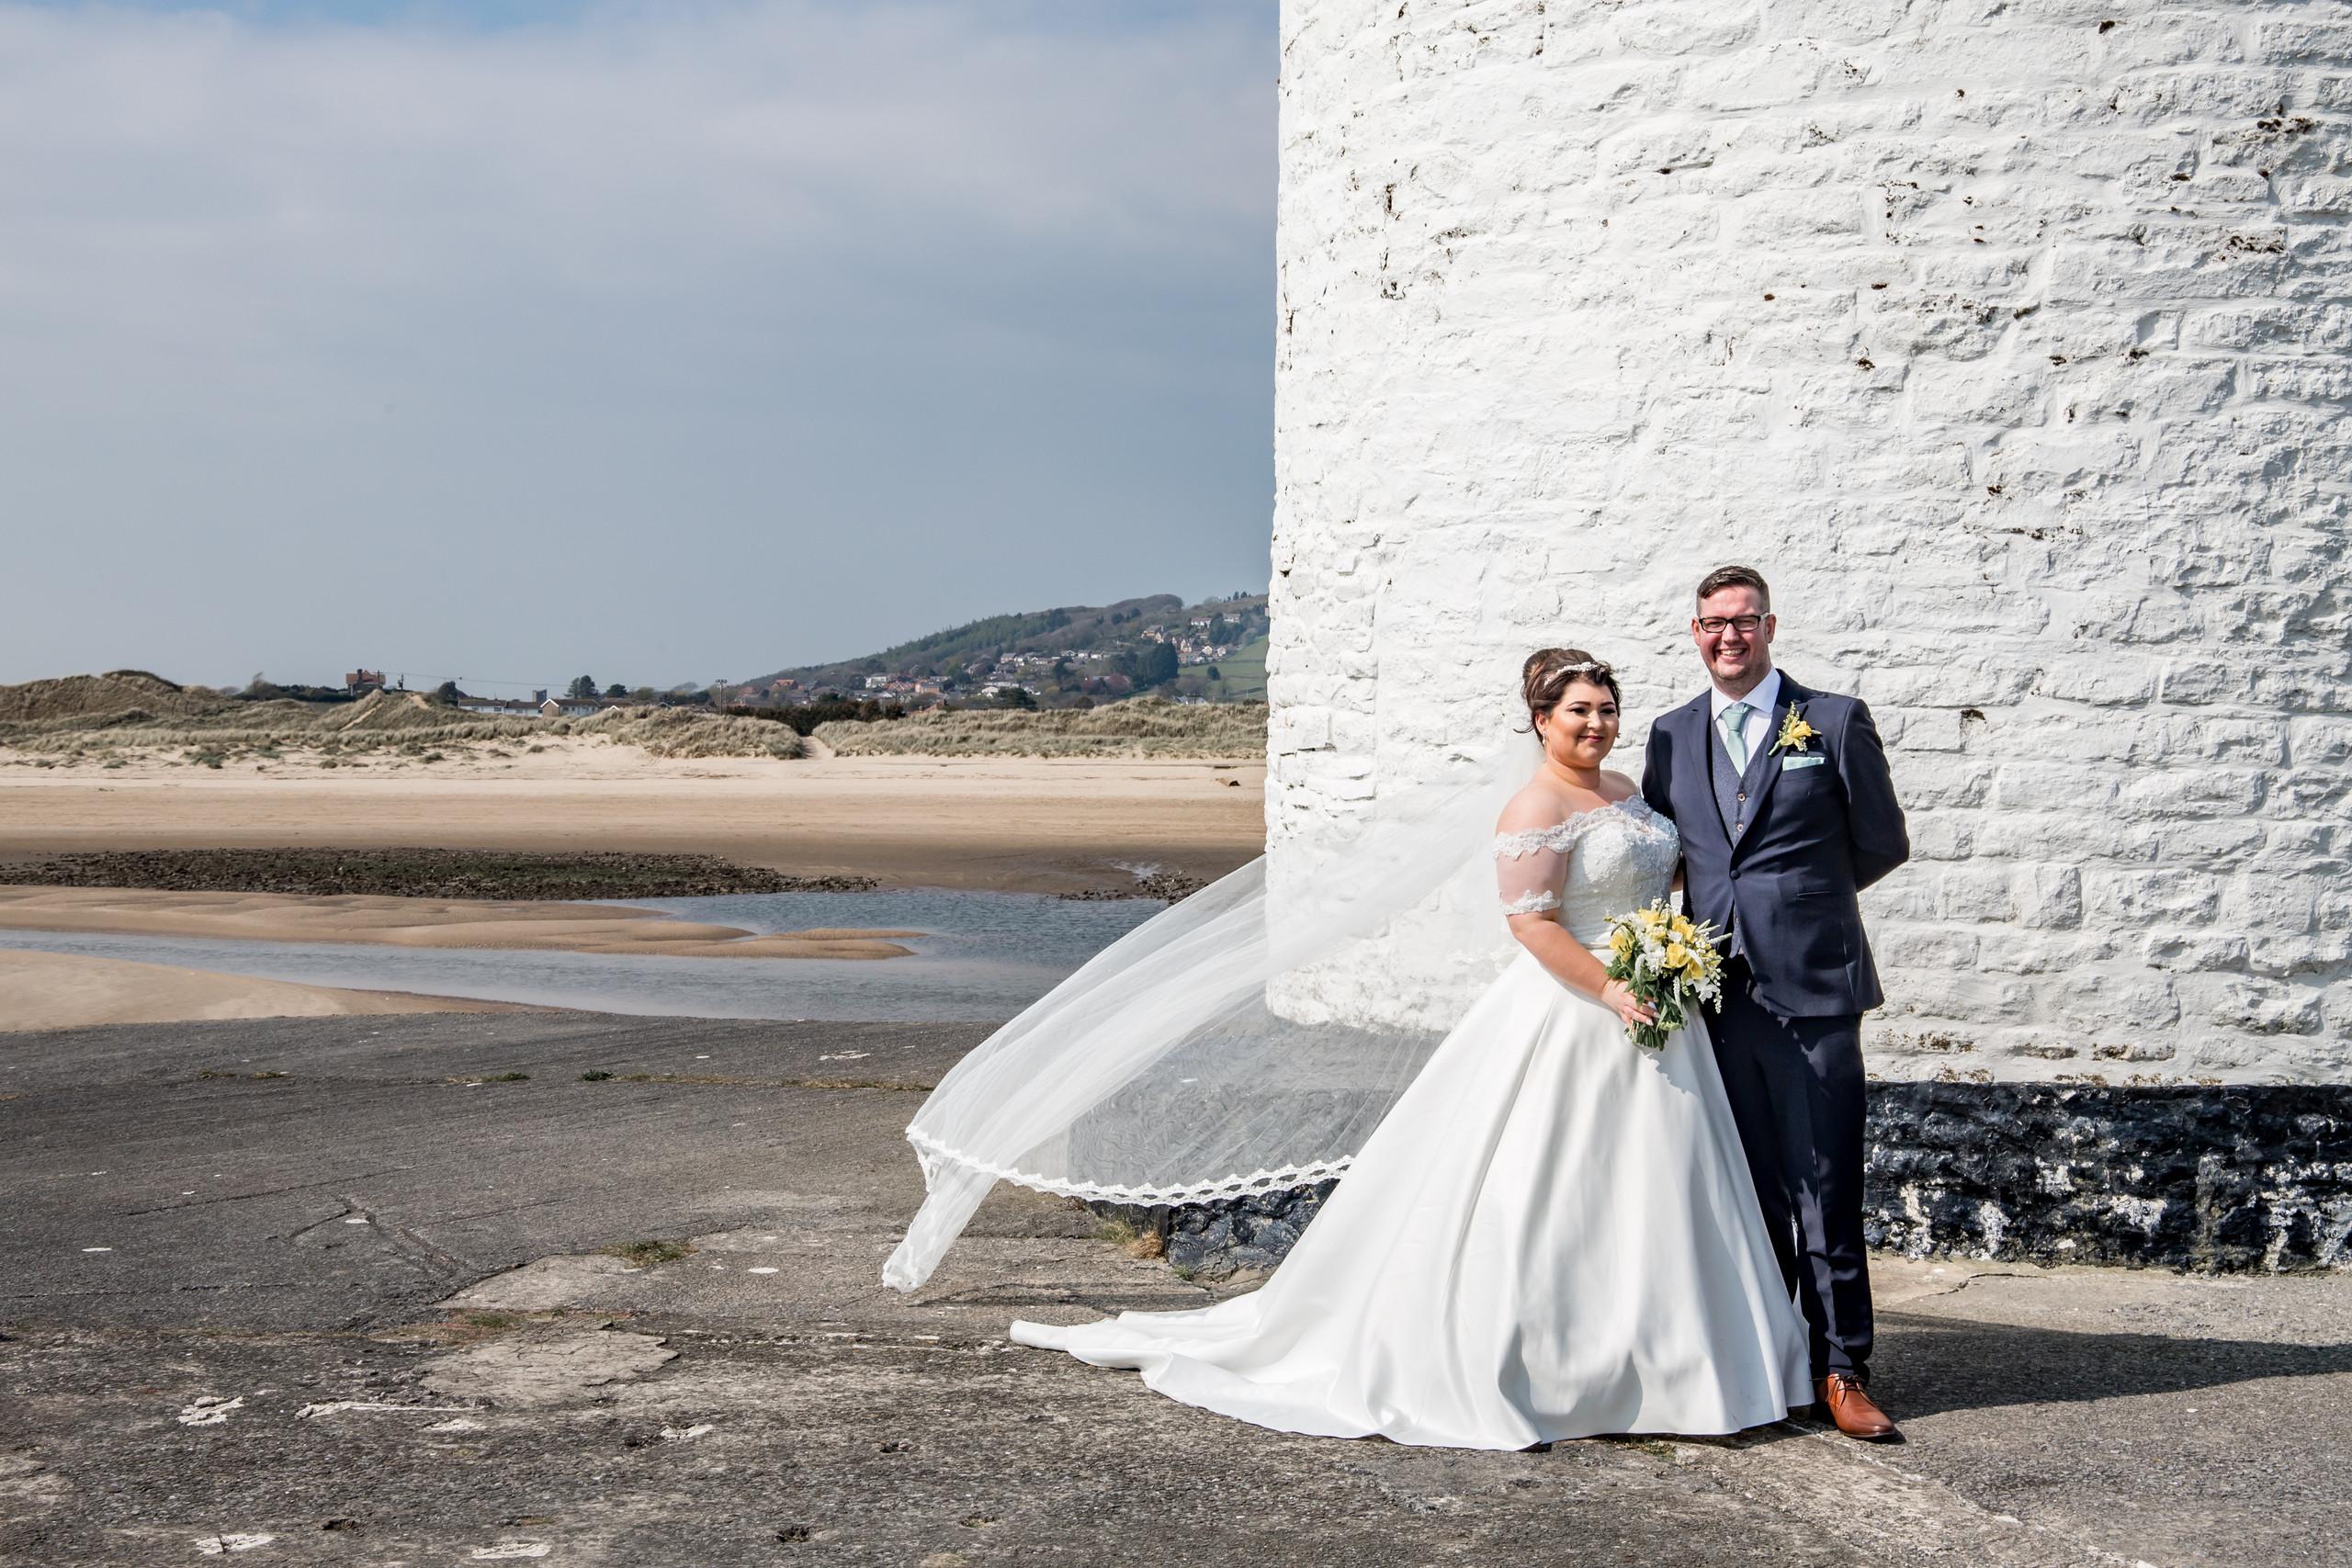 Burry Port Wedding Photography near the Gower and Swansea Beach